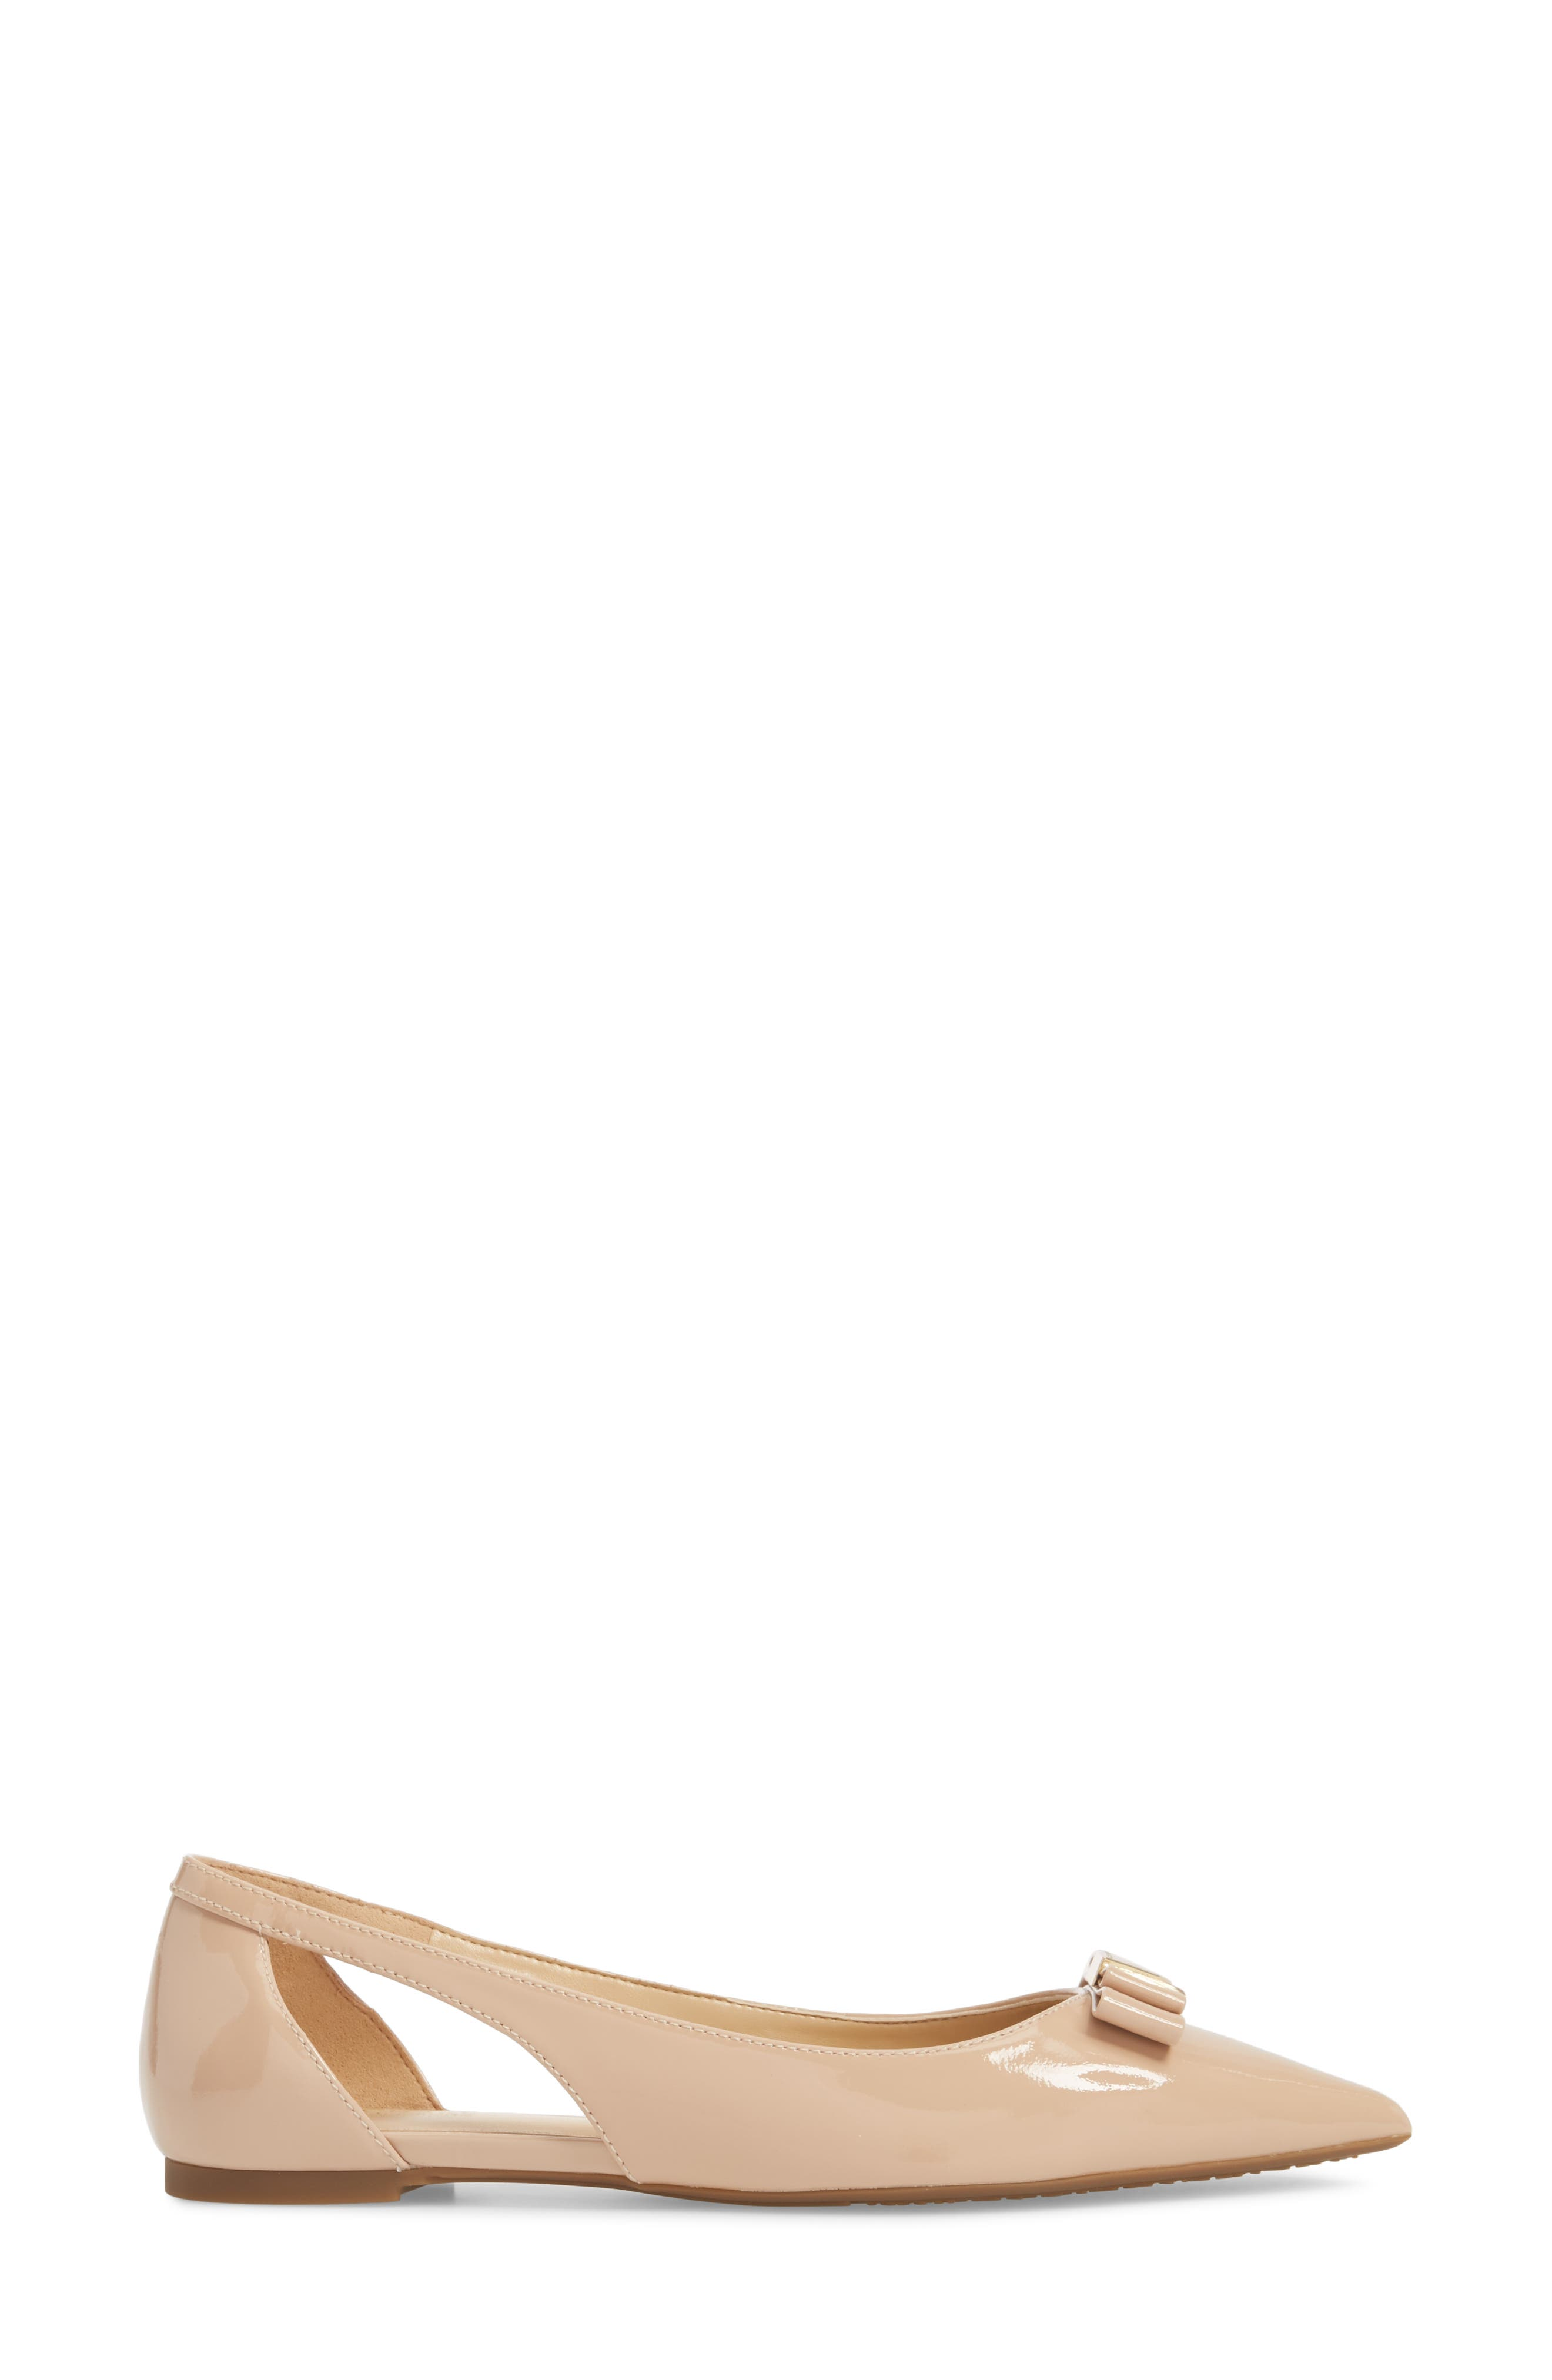 Carlson Cutout Flat,                             Alternate thumbnail 5, color,                             Light Blush Patent Leather